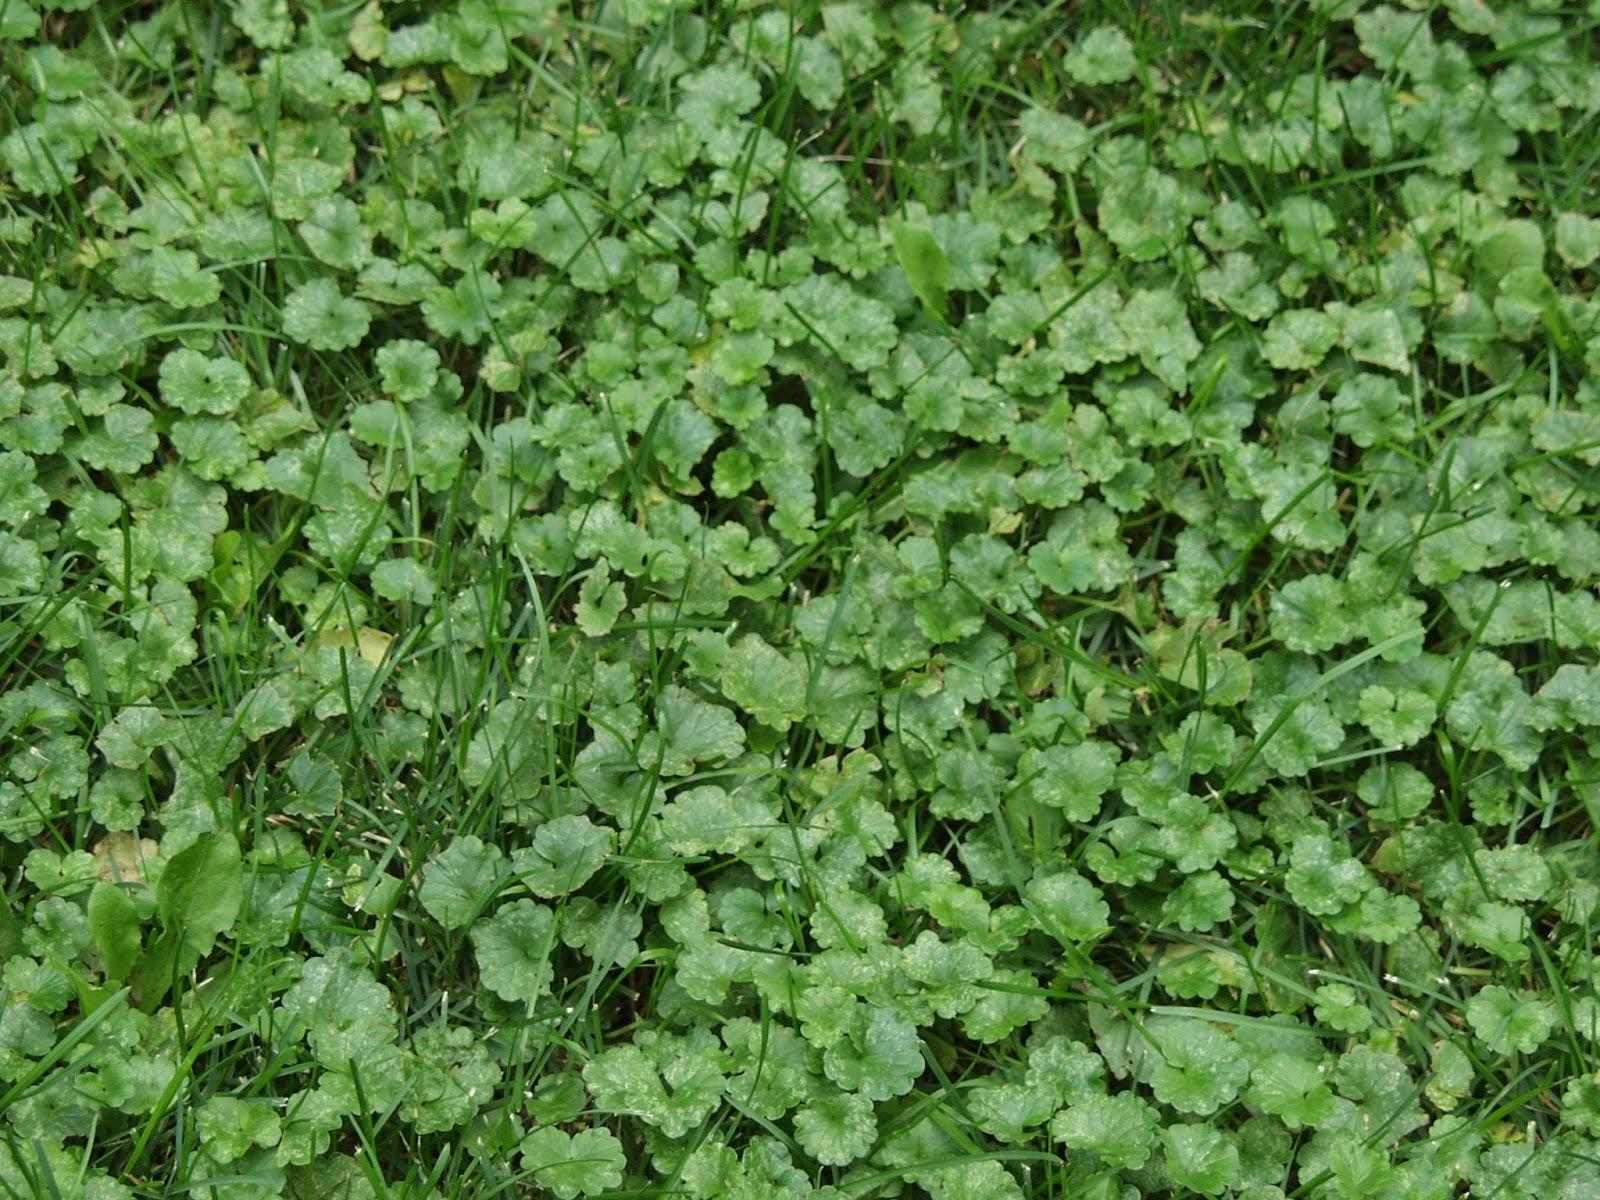 Ground%2Bivy%2B2 Crawling Houseplants on